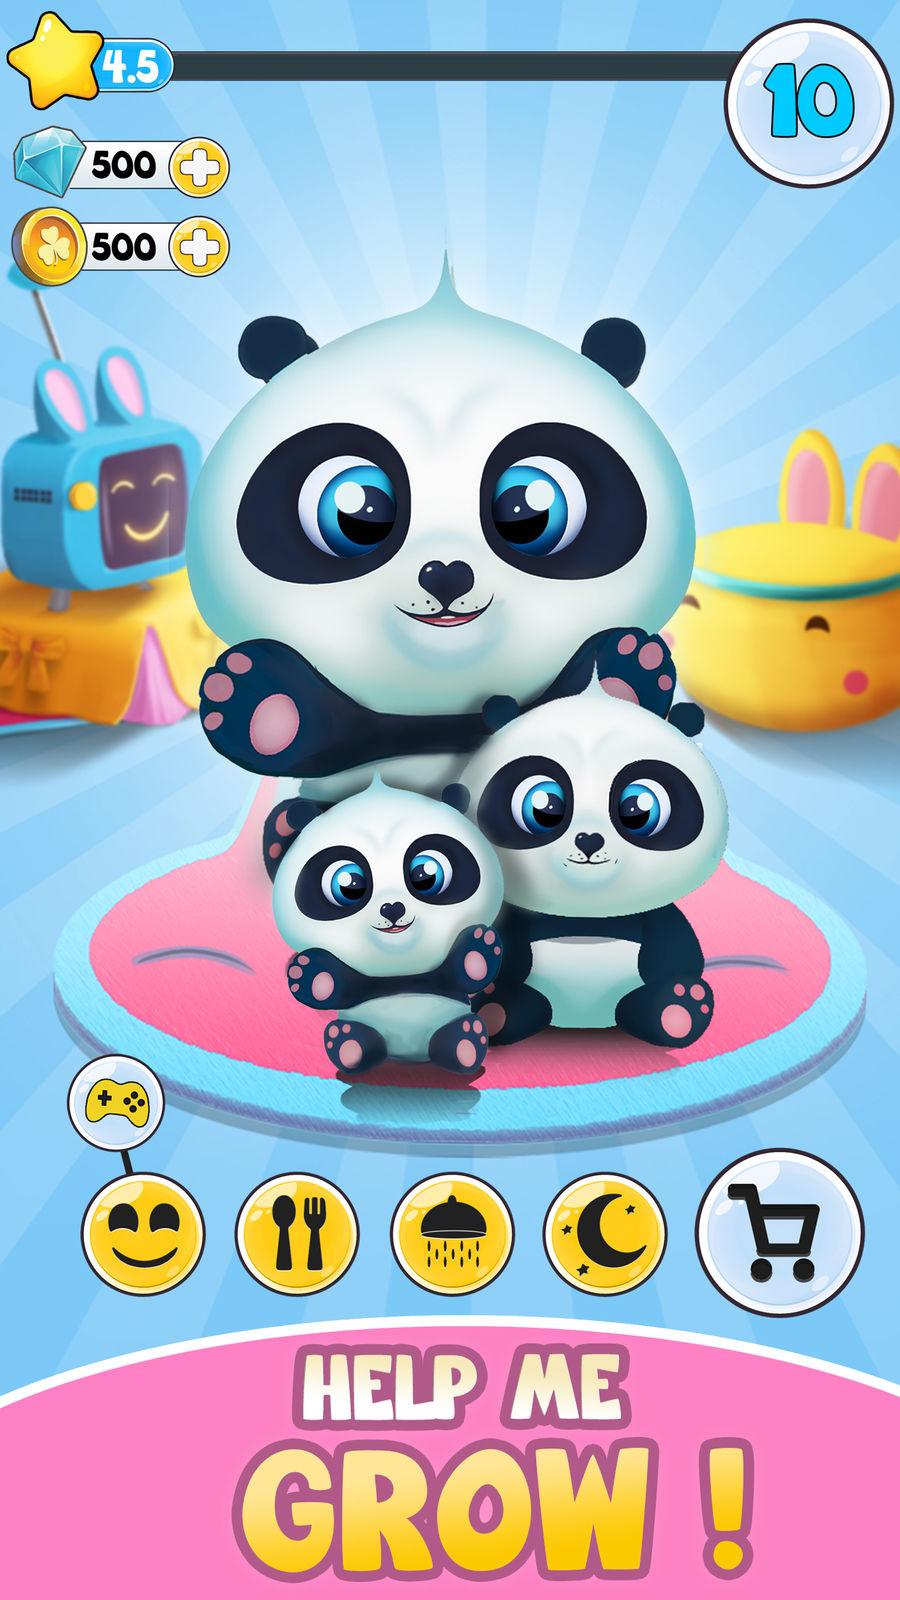 Pu - Babies panda bears virtual pet care game